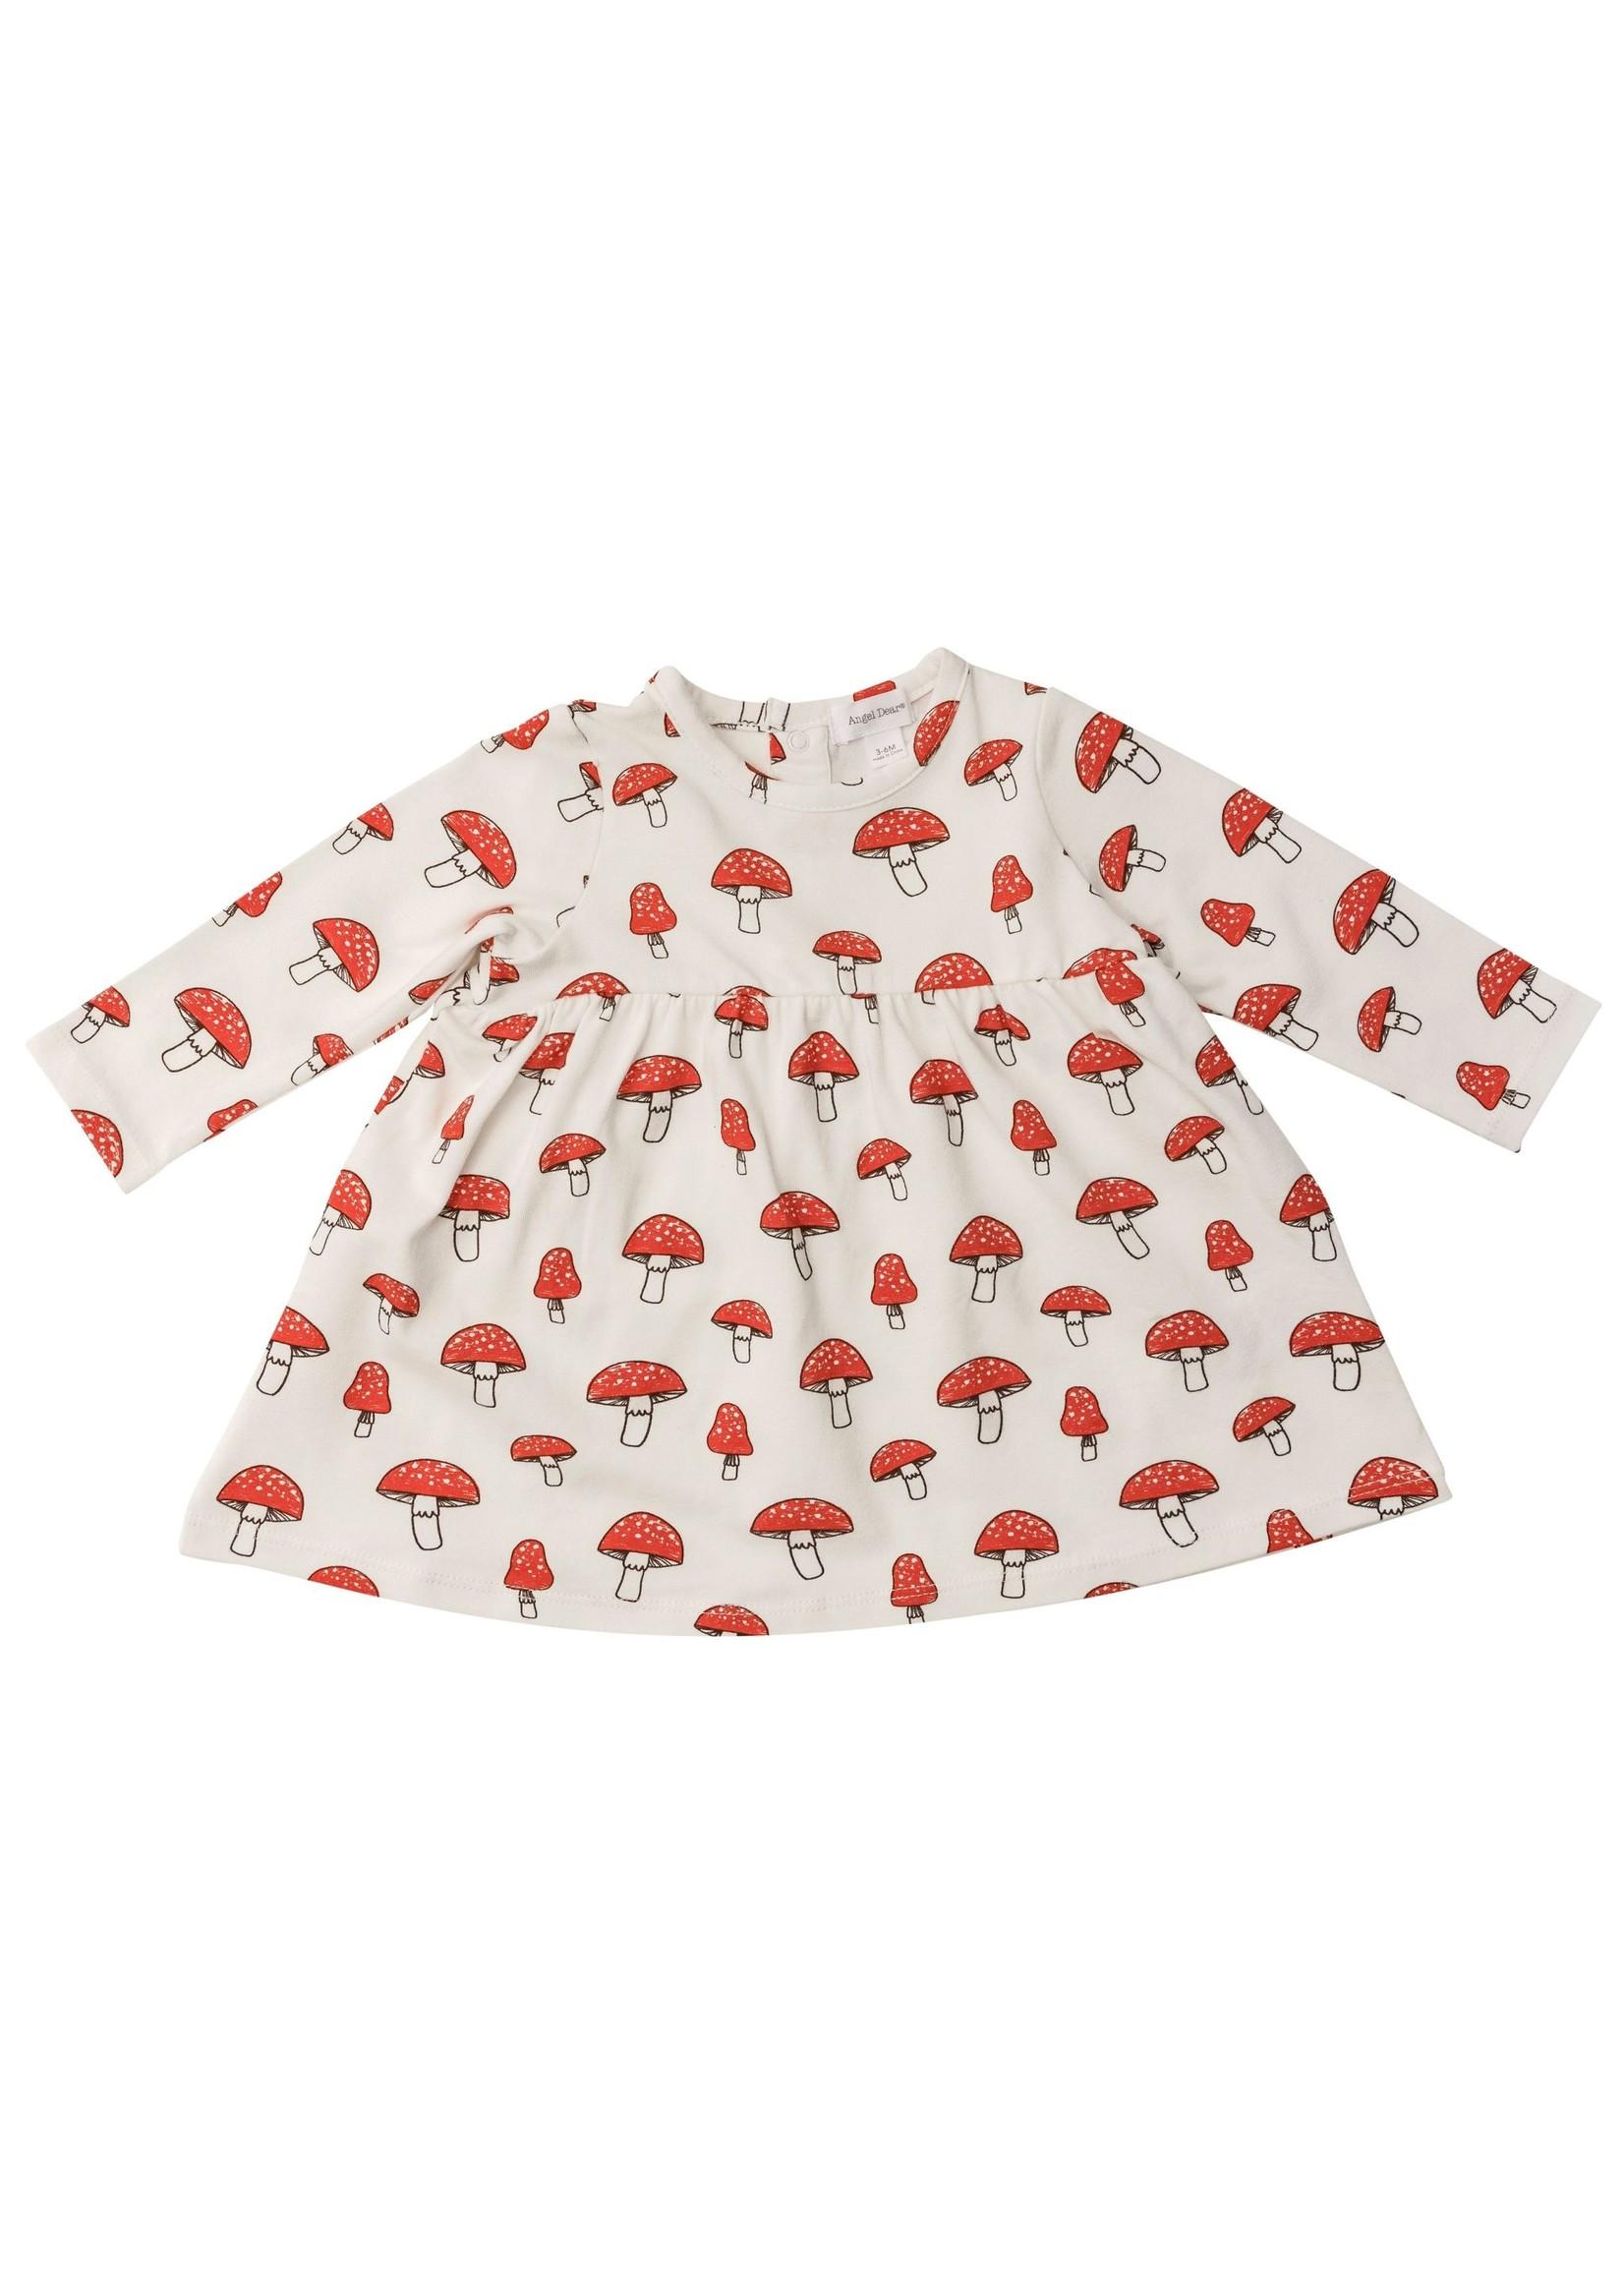 Angel Dear Mushrooms Simple Dress & Bloomer